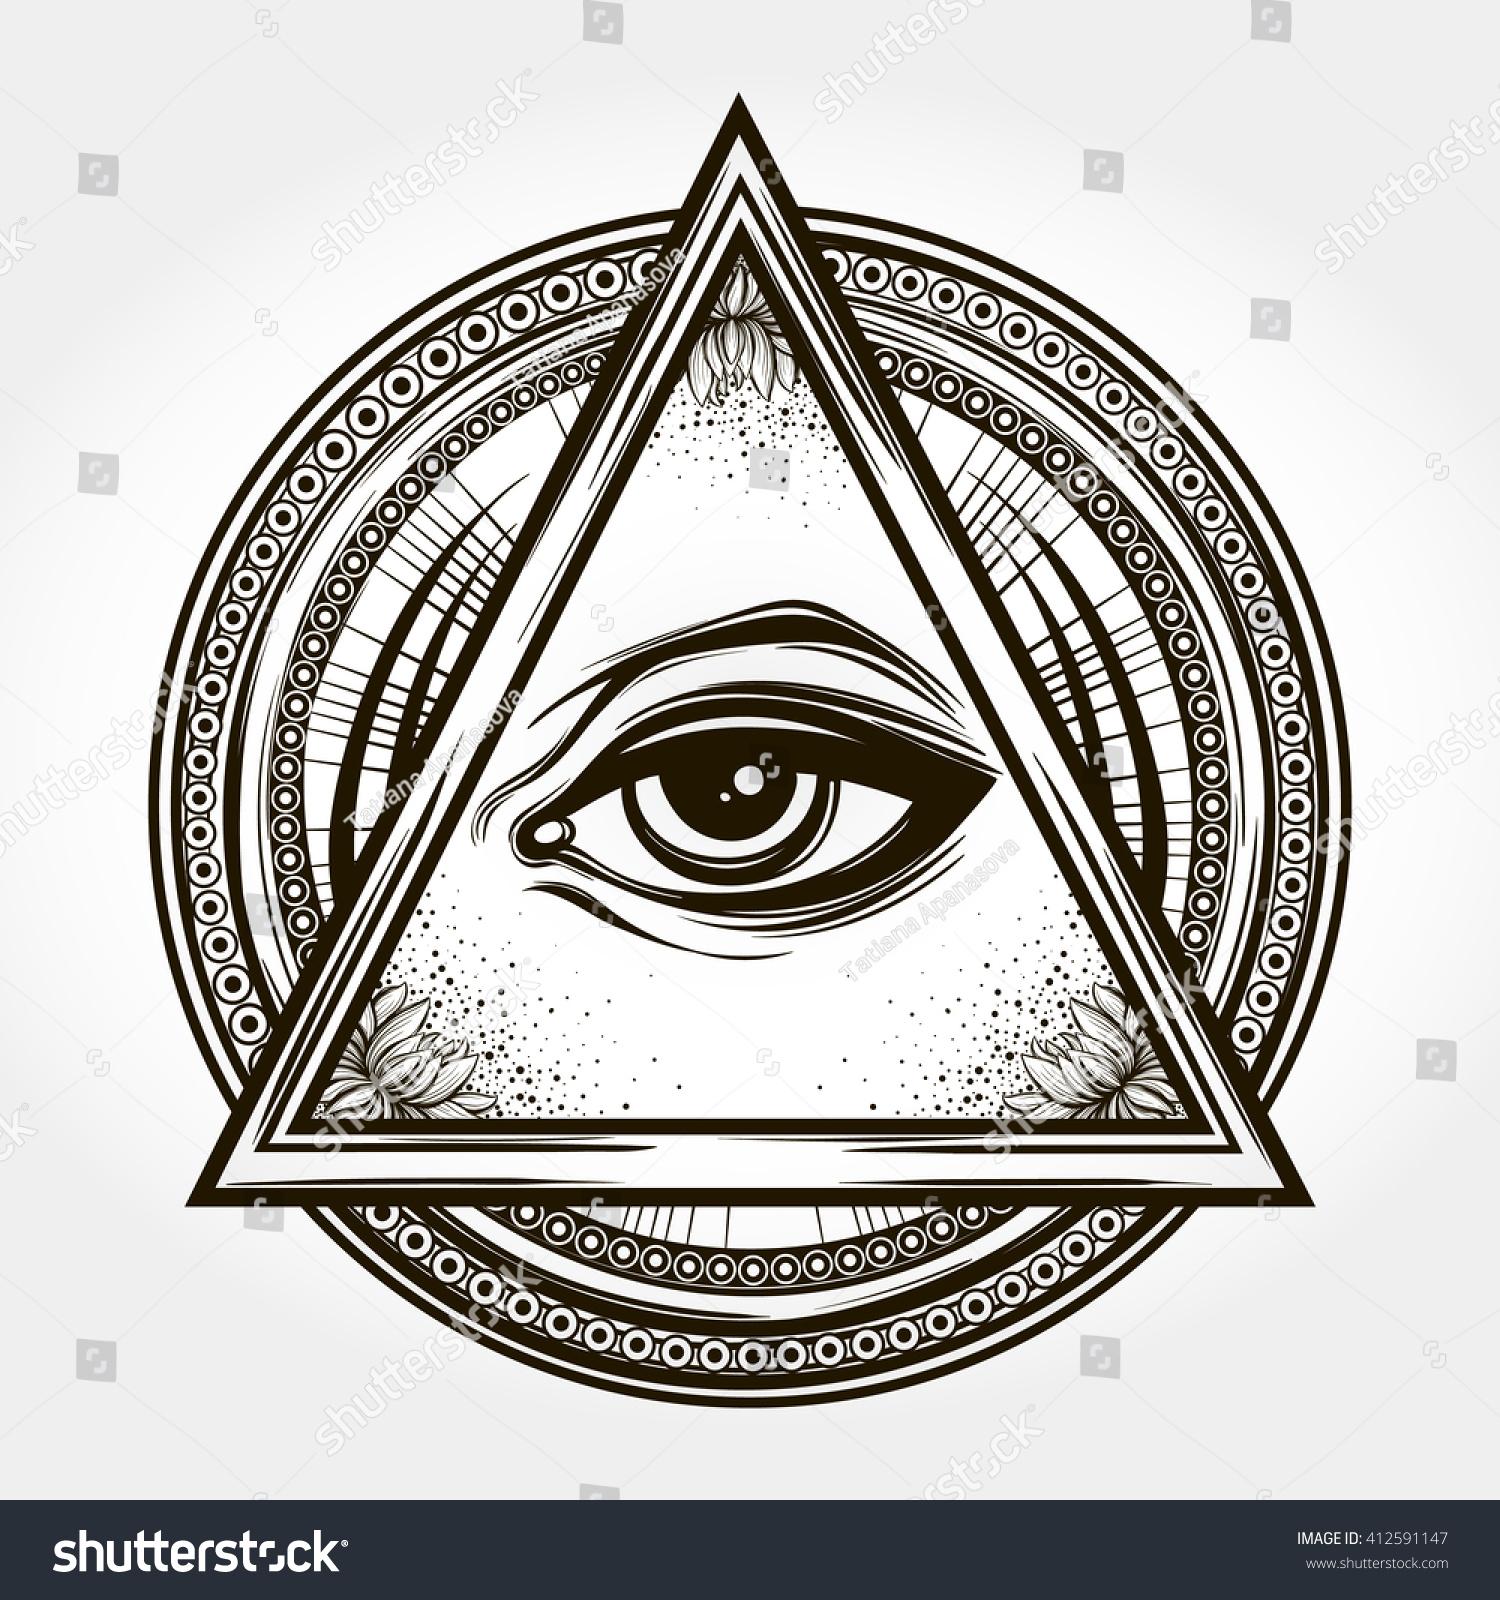 Handdrawn Eye Providence All Seeing Eye Stock Vector Royalty Free